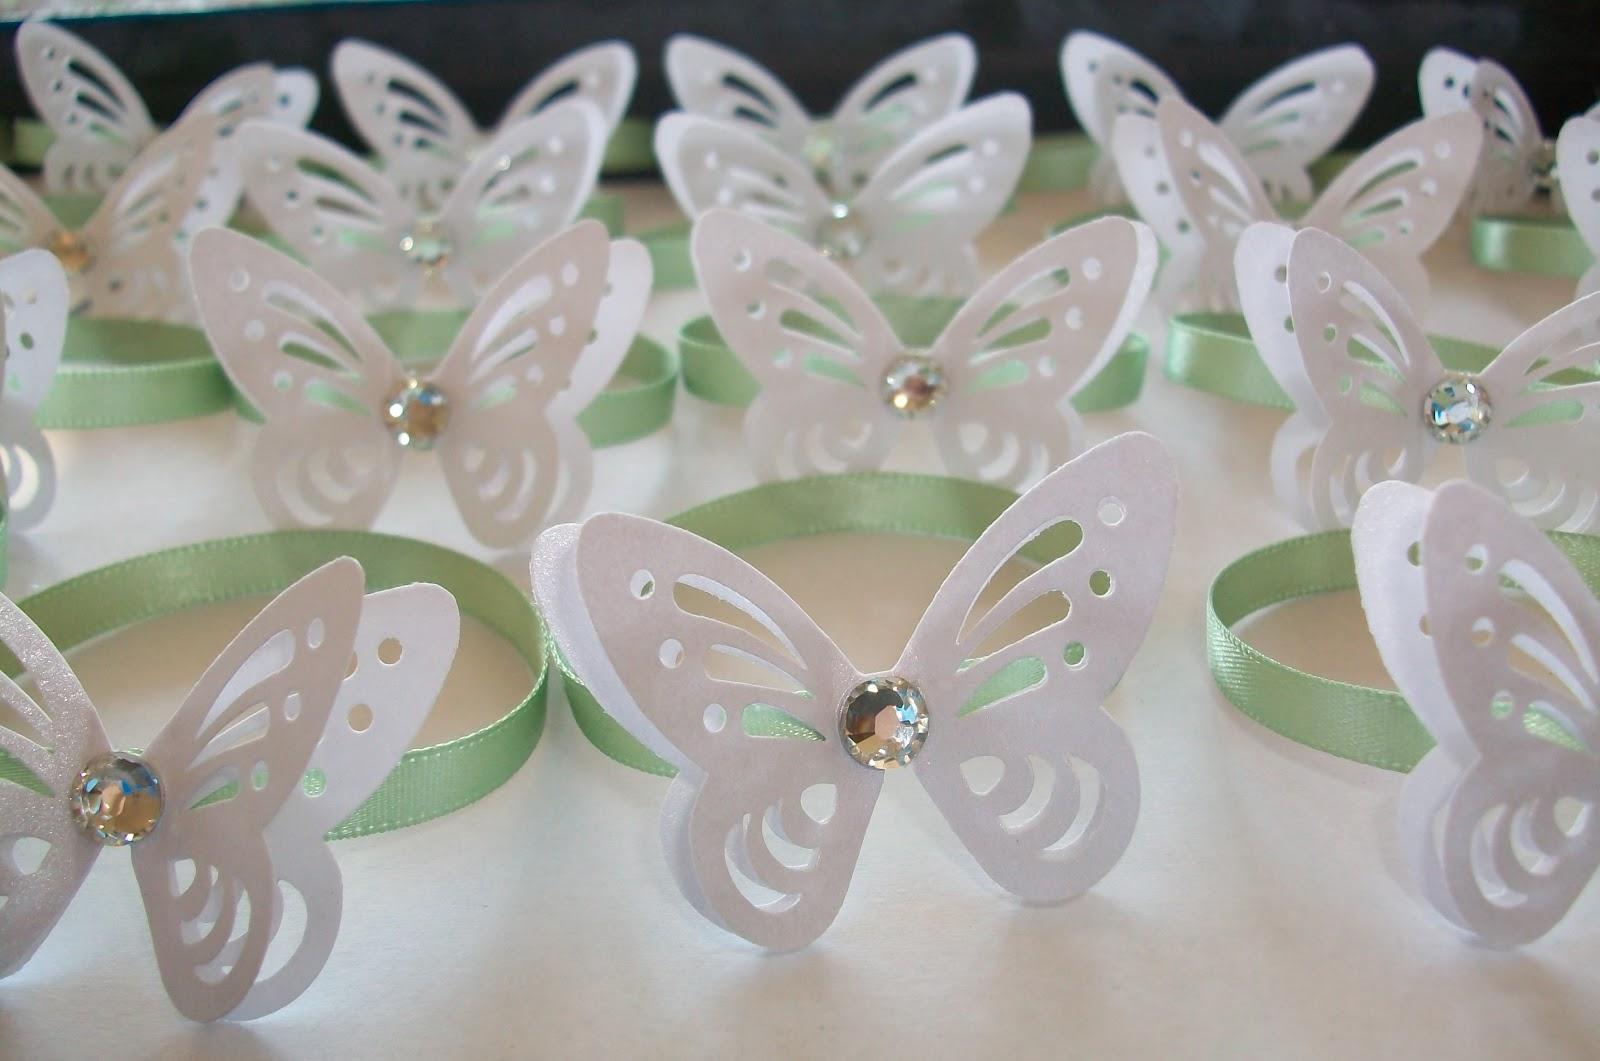 Matrimonio Tema Farfalle : Sara crea legatovaglioli verdi tema farfalle perlate